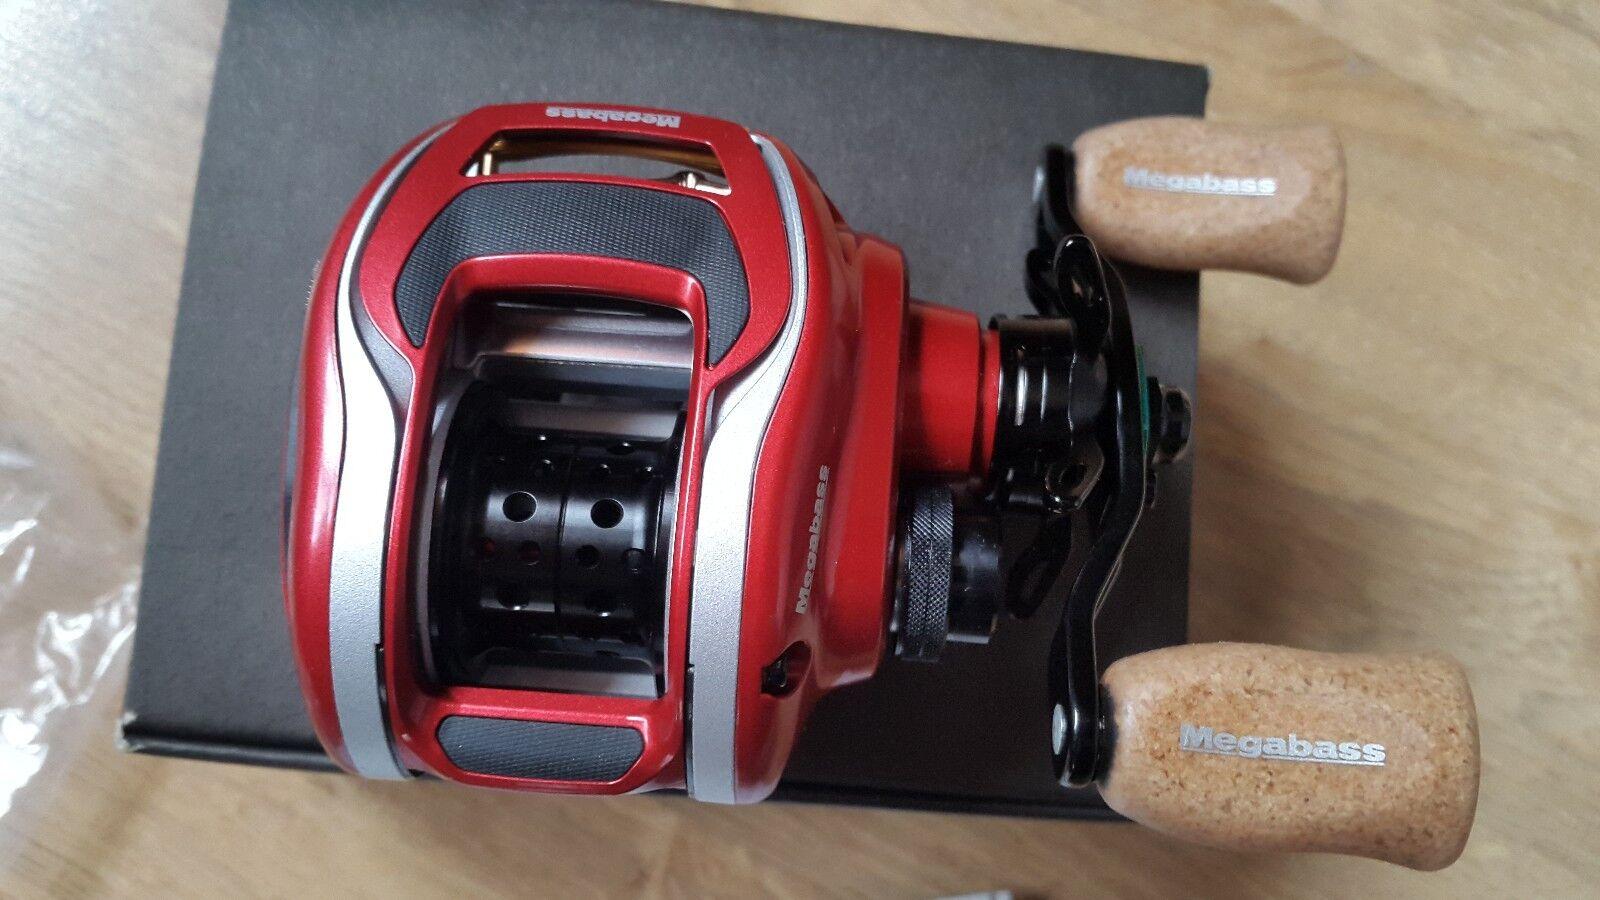 Megabass Ito FX 68R red,2014 Limited(Daiwa T3sv)